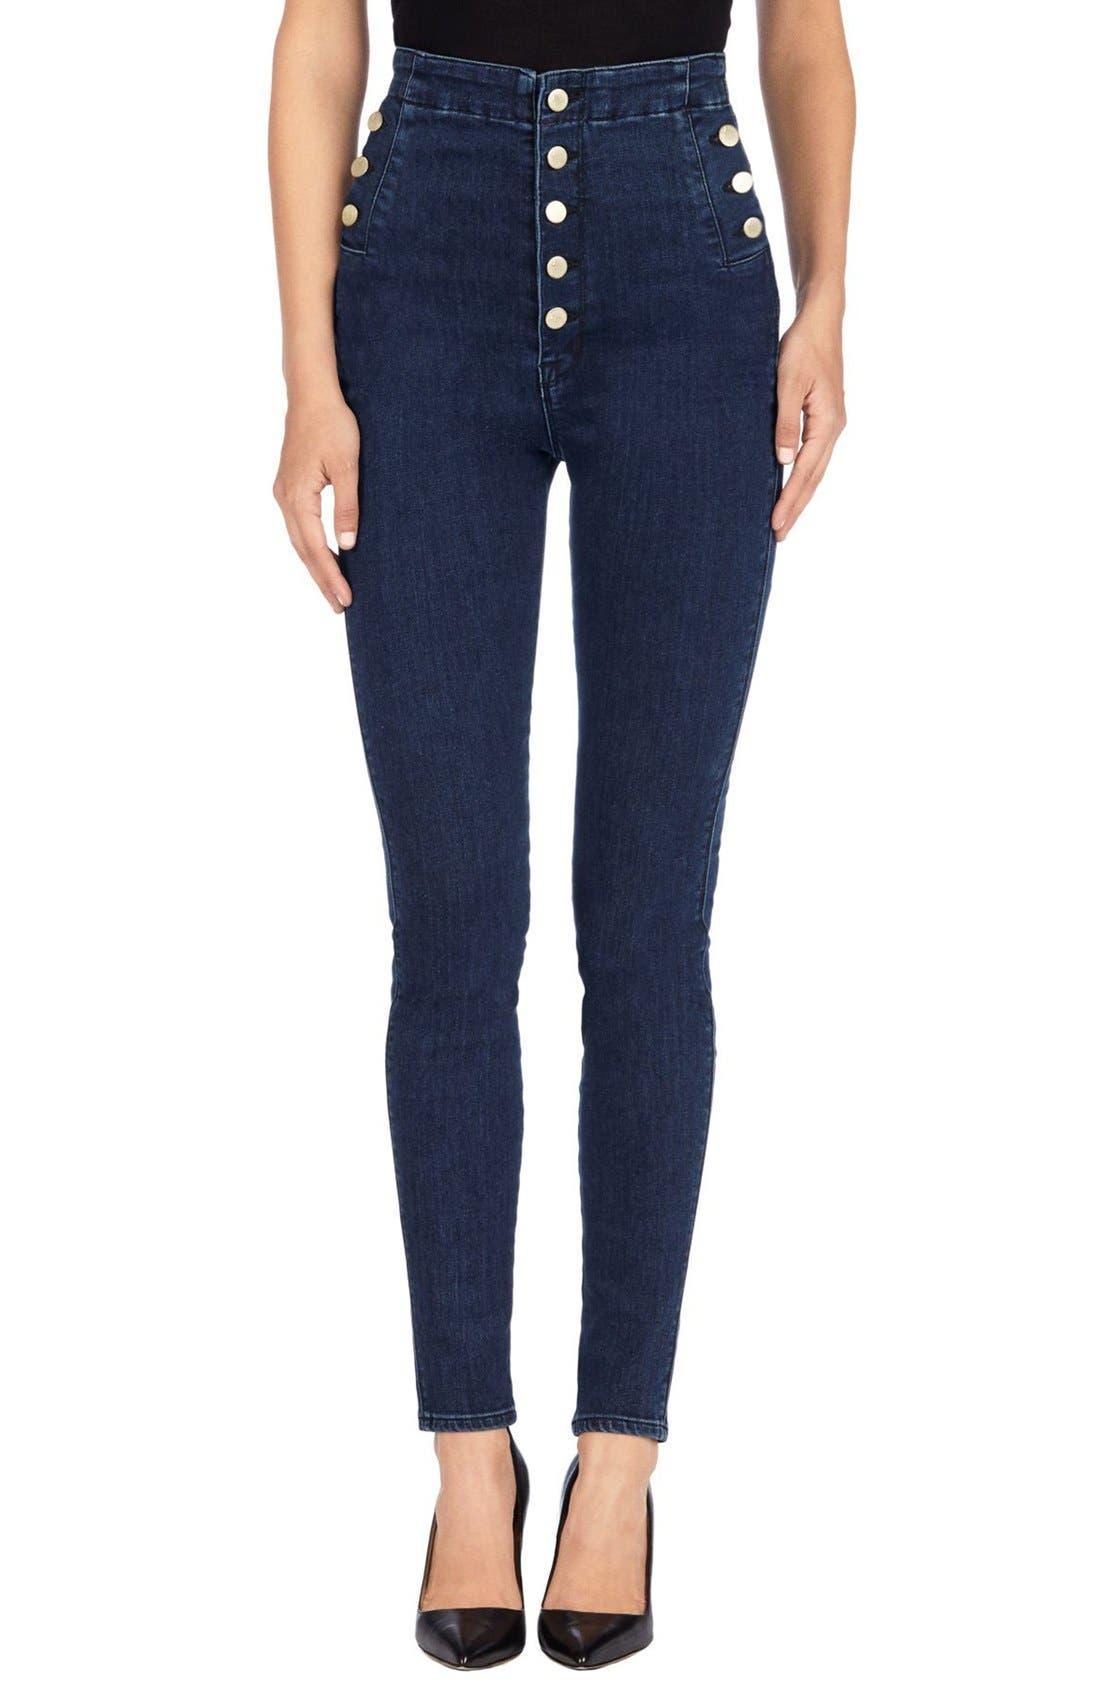 Main Image - J Brand 'Natasha Sky High' High Rise Skinny Jeans (Allegiance)